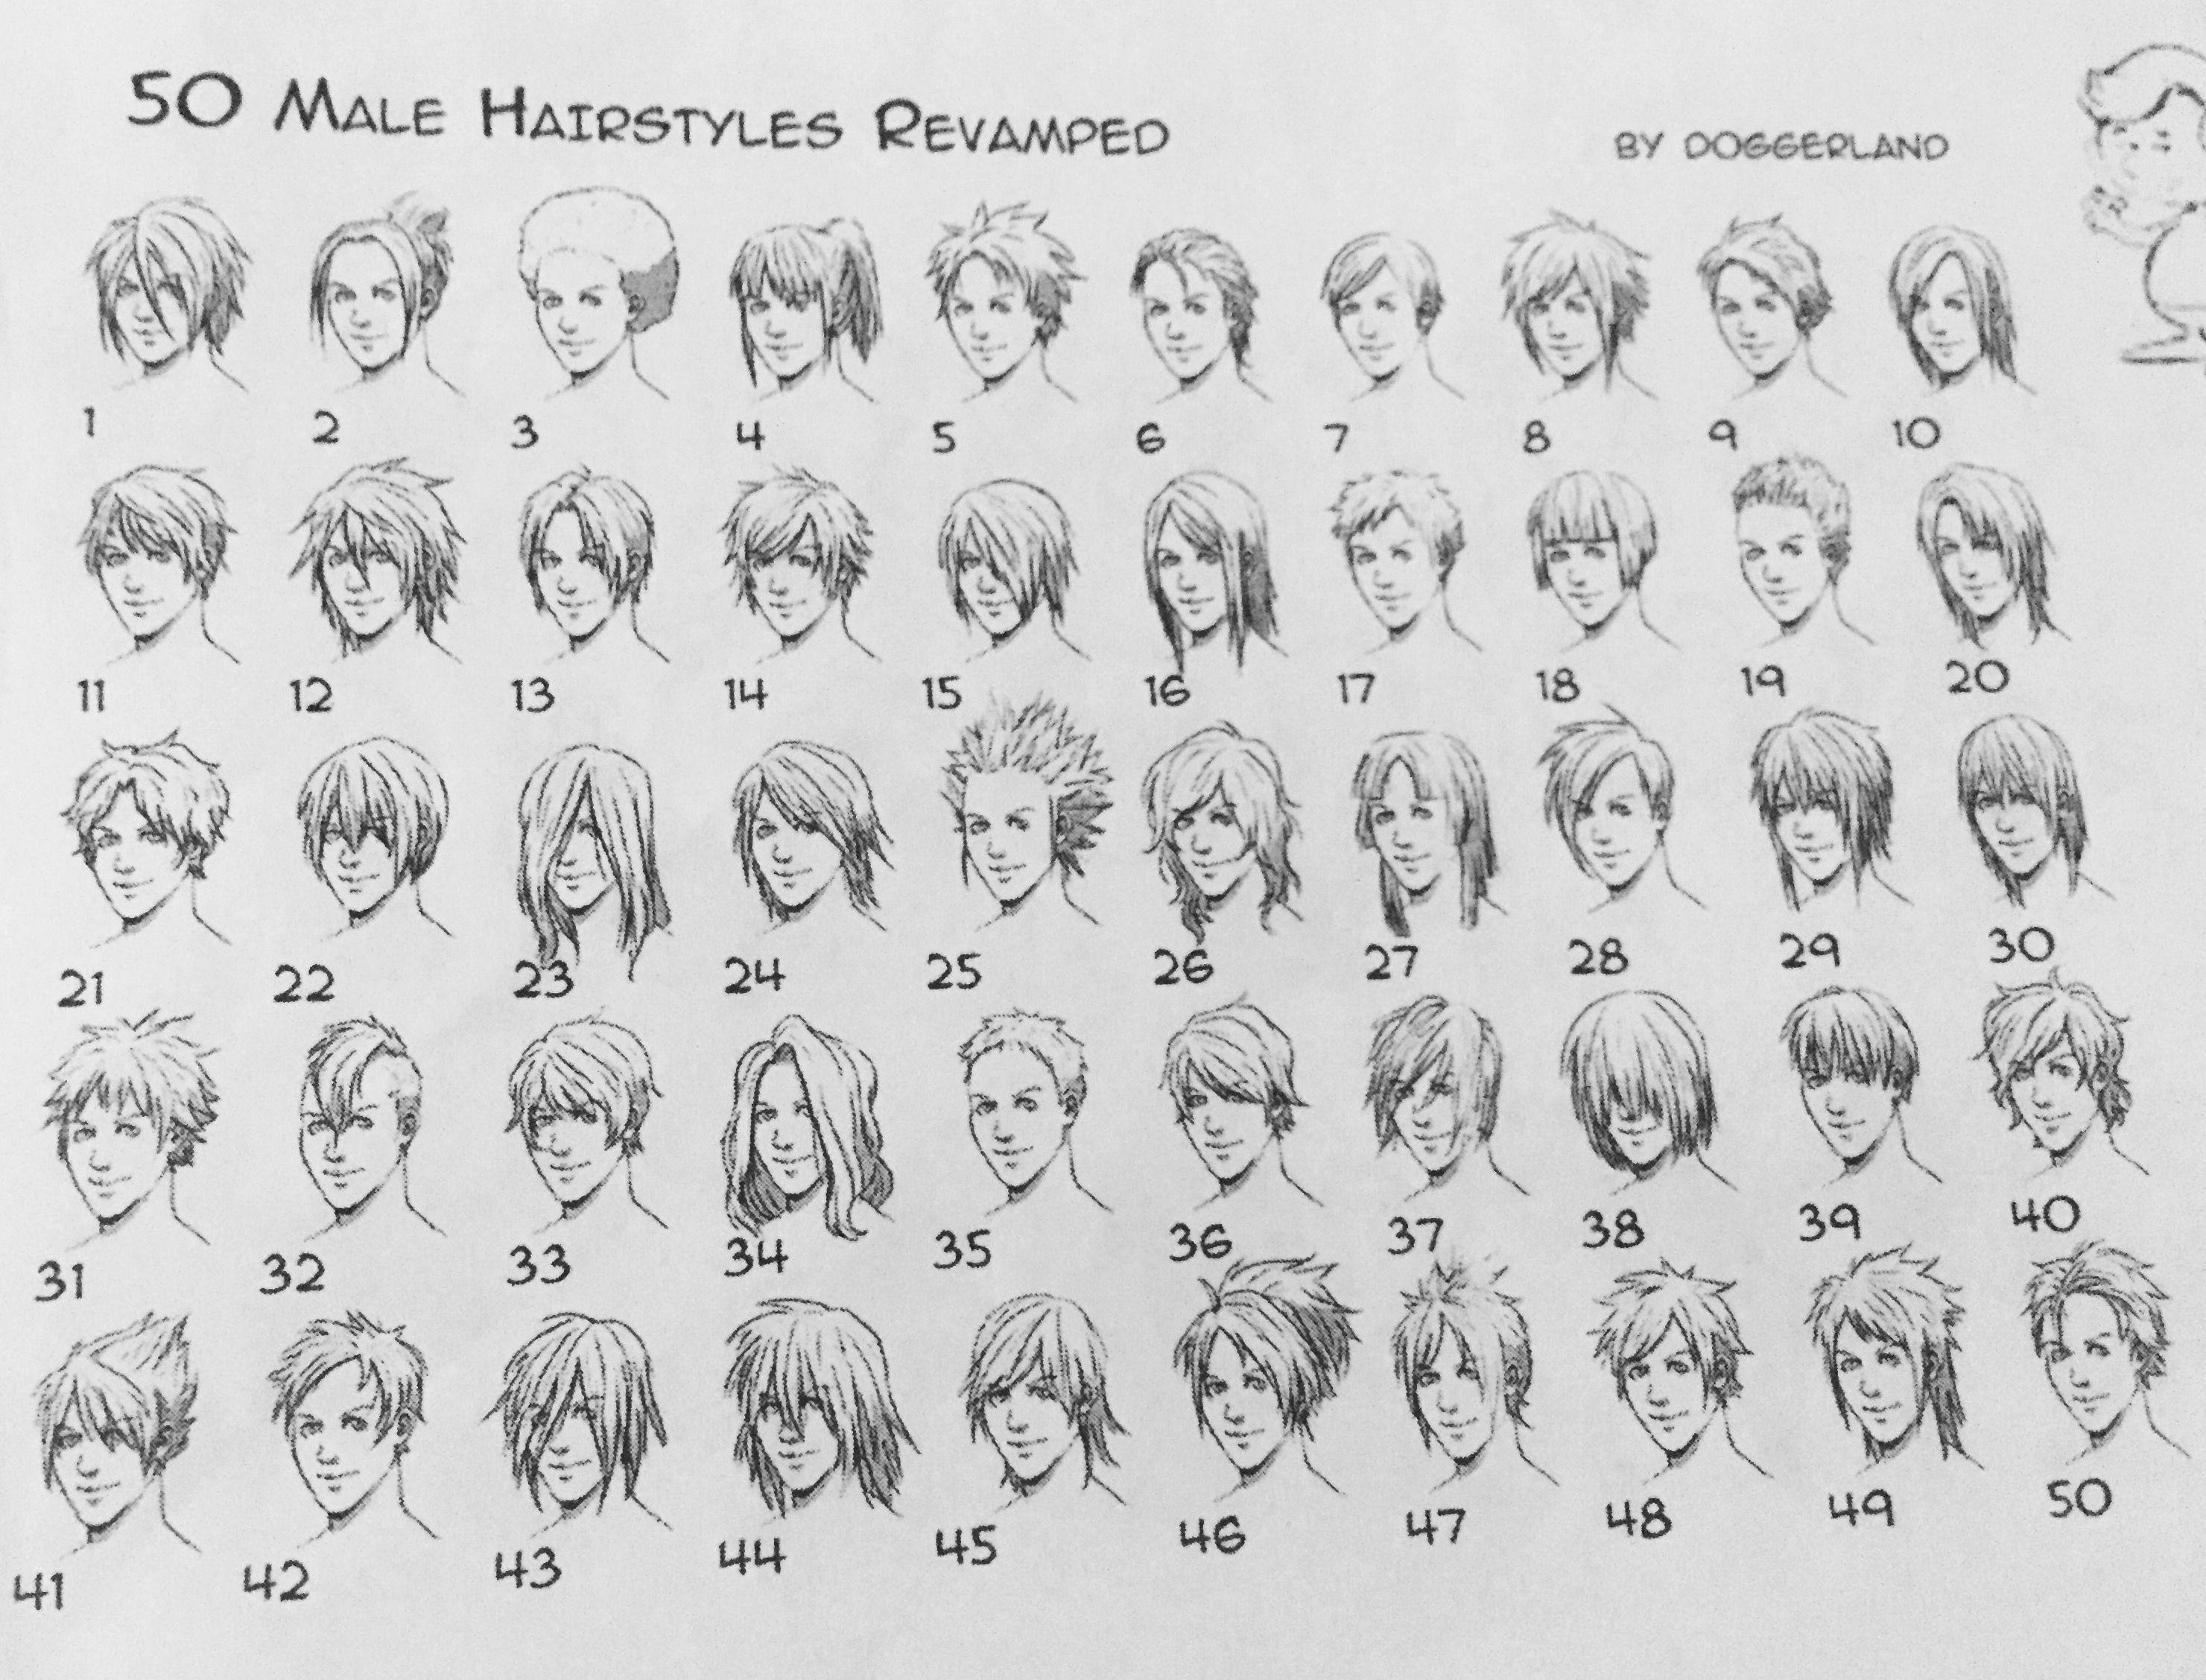 Men's hairstyles Прически аниме, Рисование волос